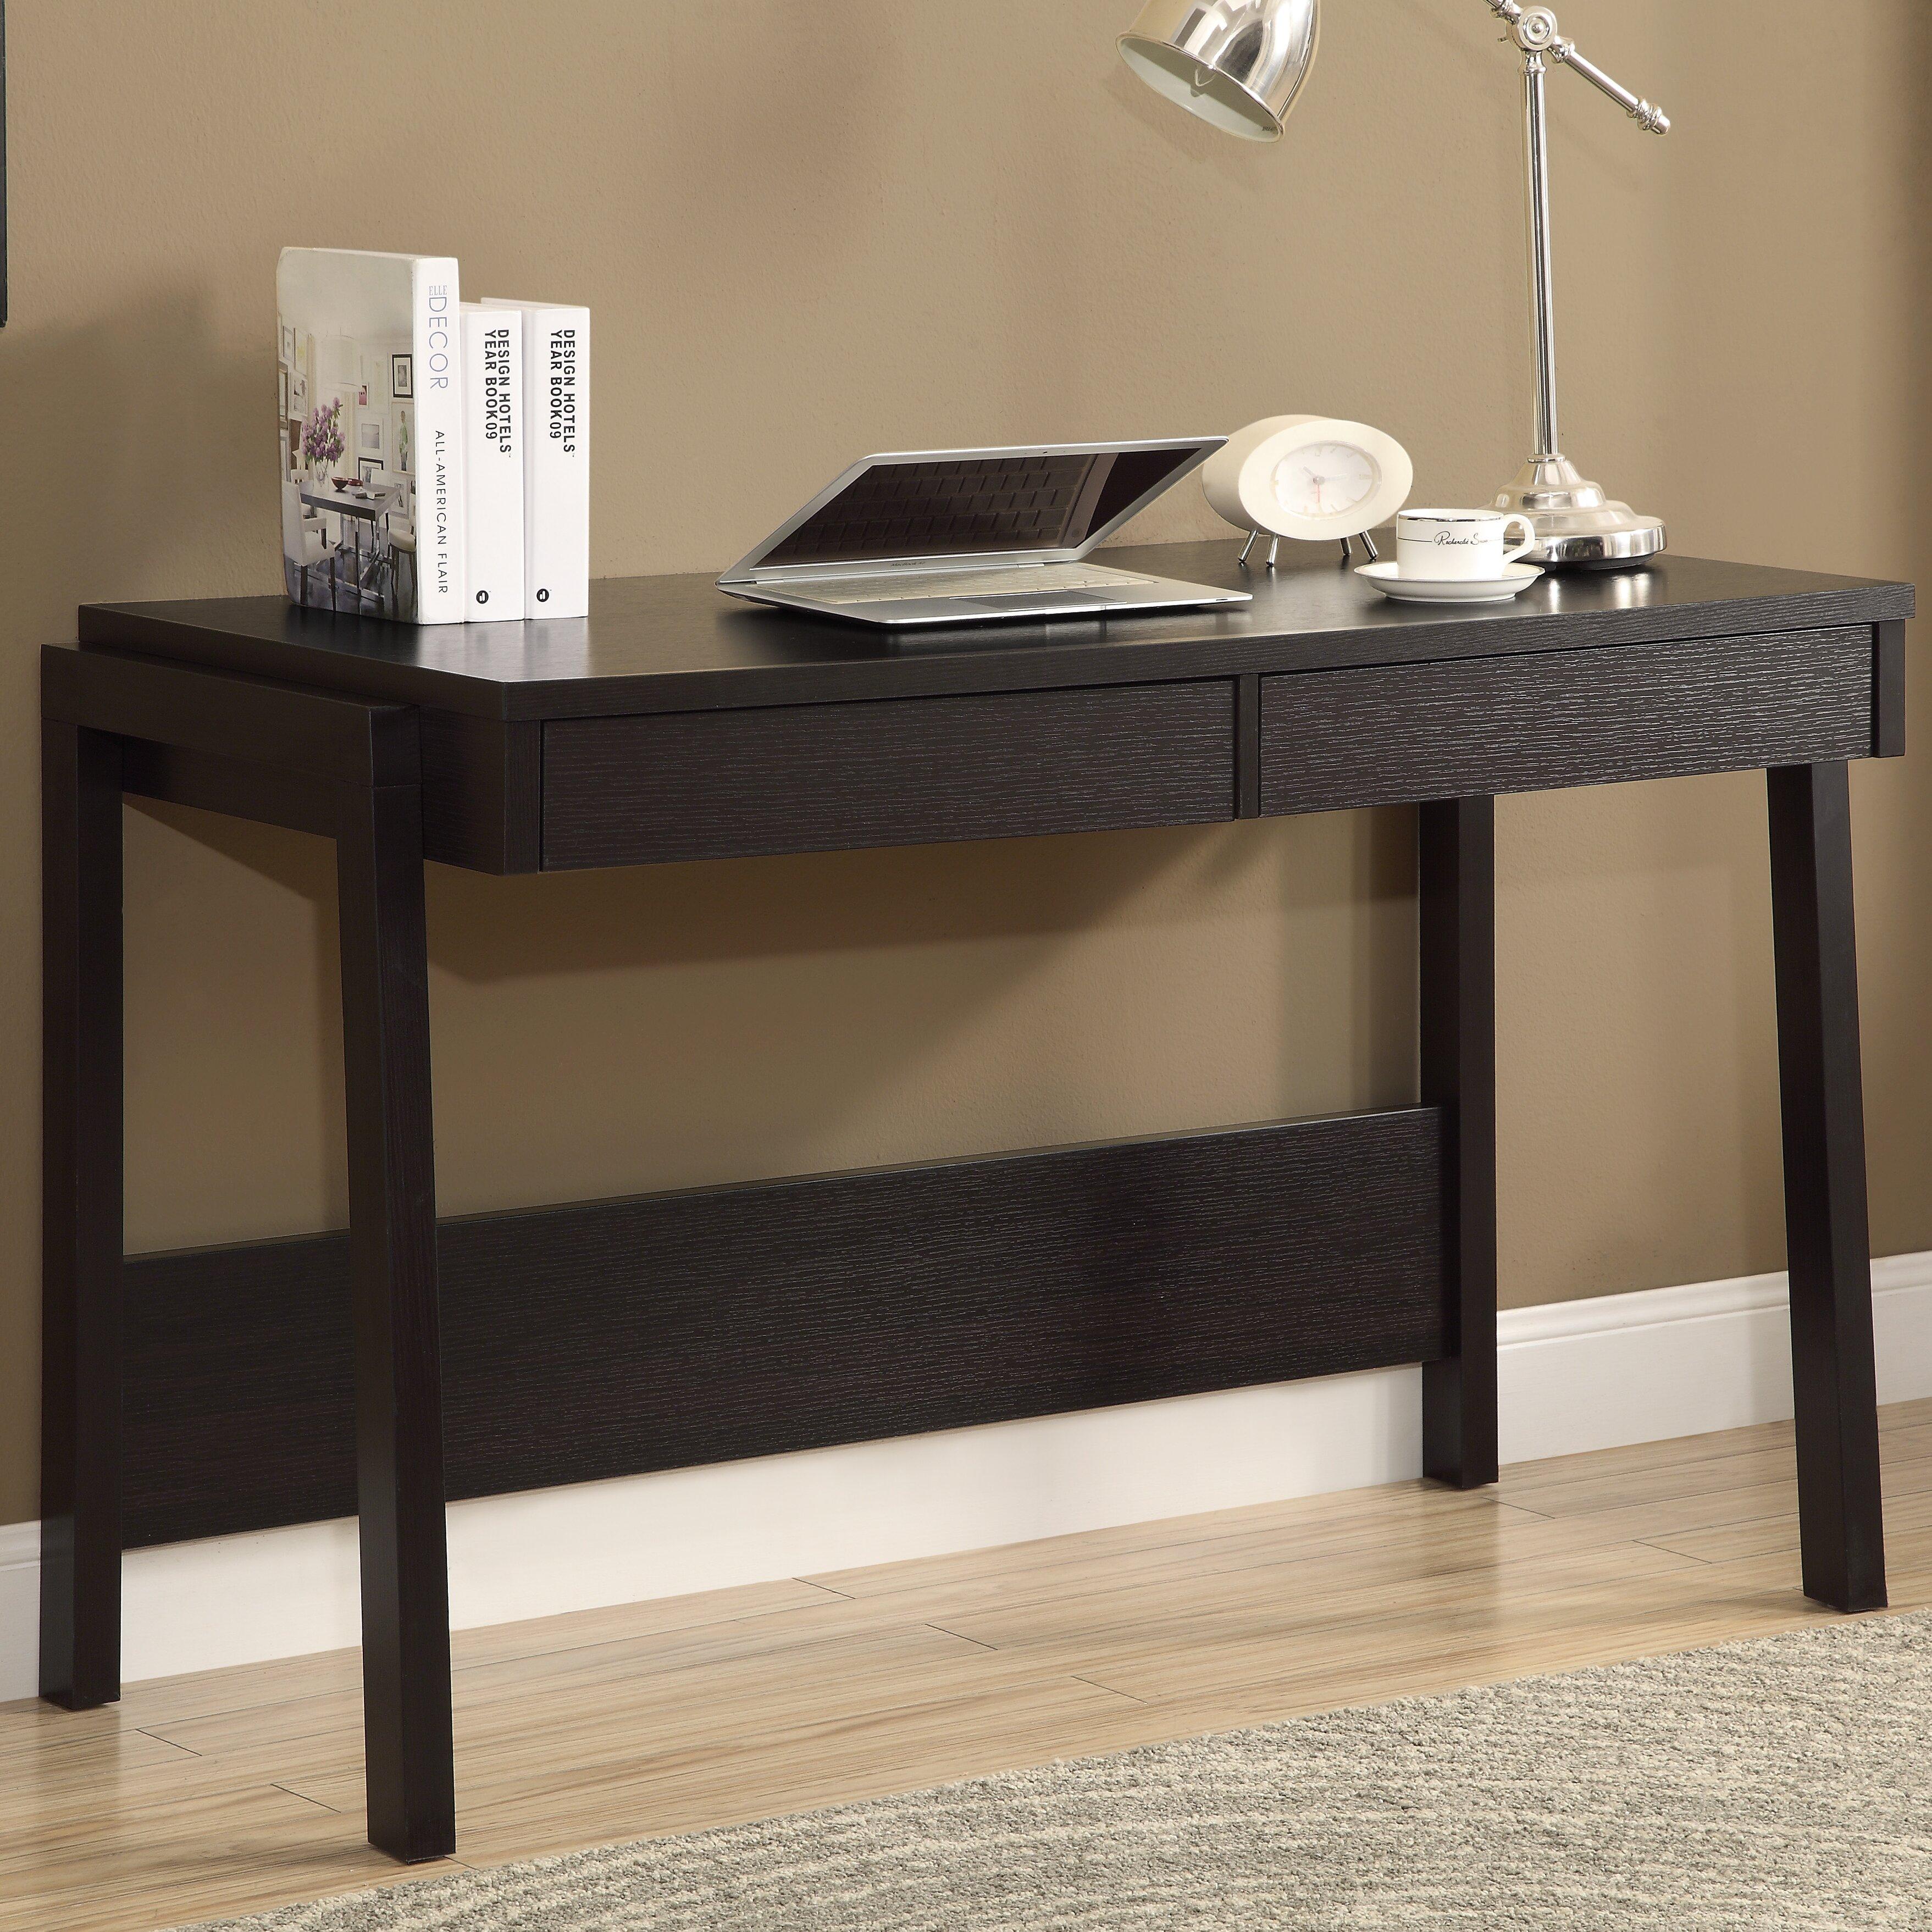 Monarch Specialties Inc Writing Desk With 2 Storage